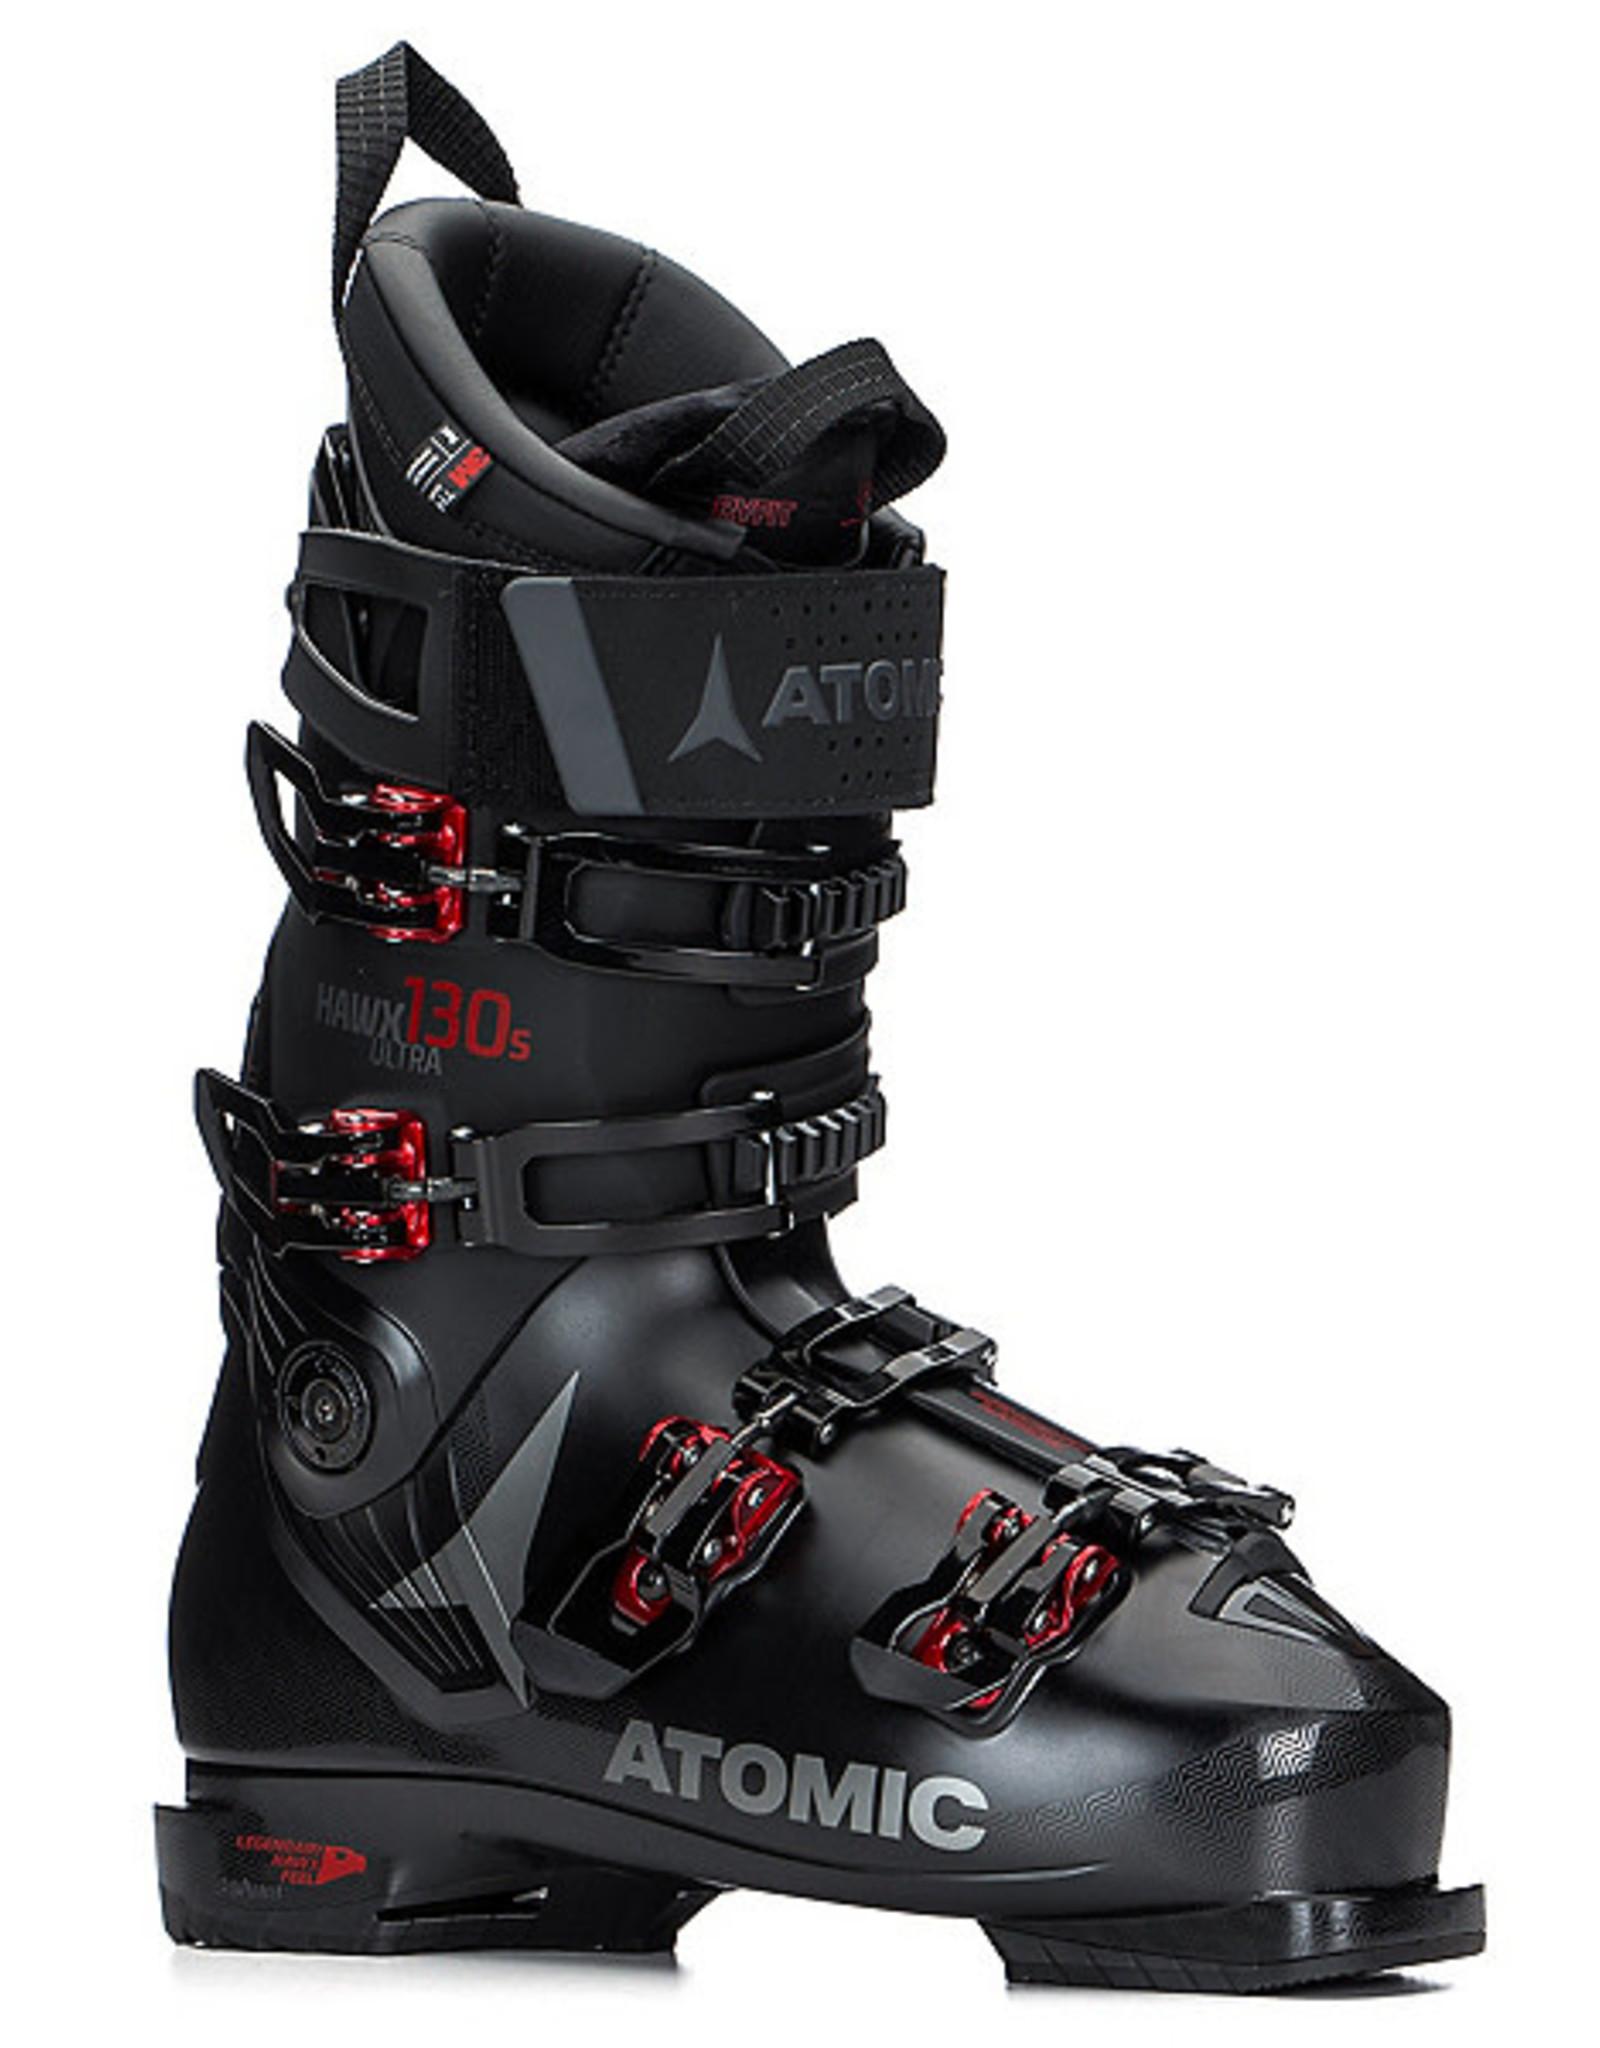 ATOMIC ATOMIC Ski Boots HAWX ULTRA 130 S (19/20)